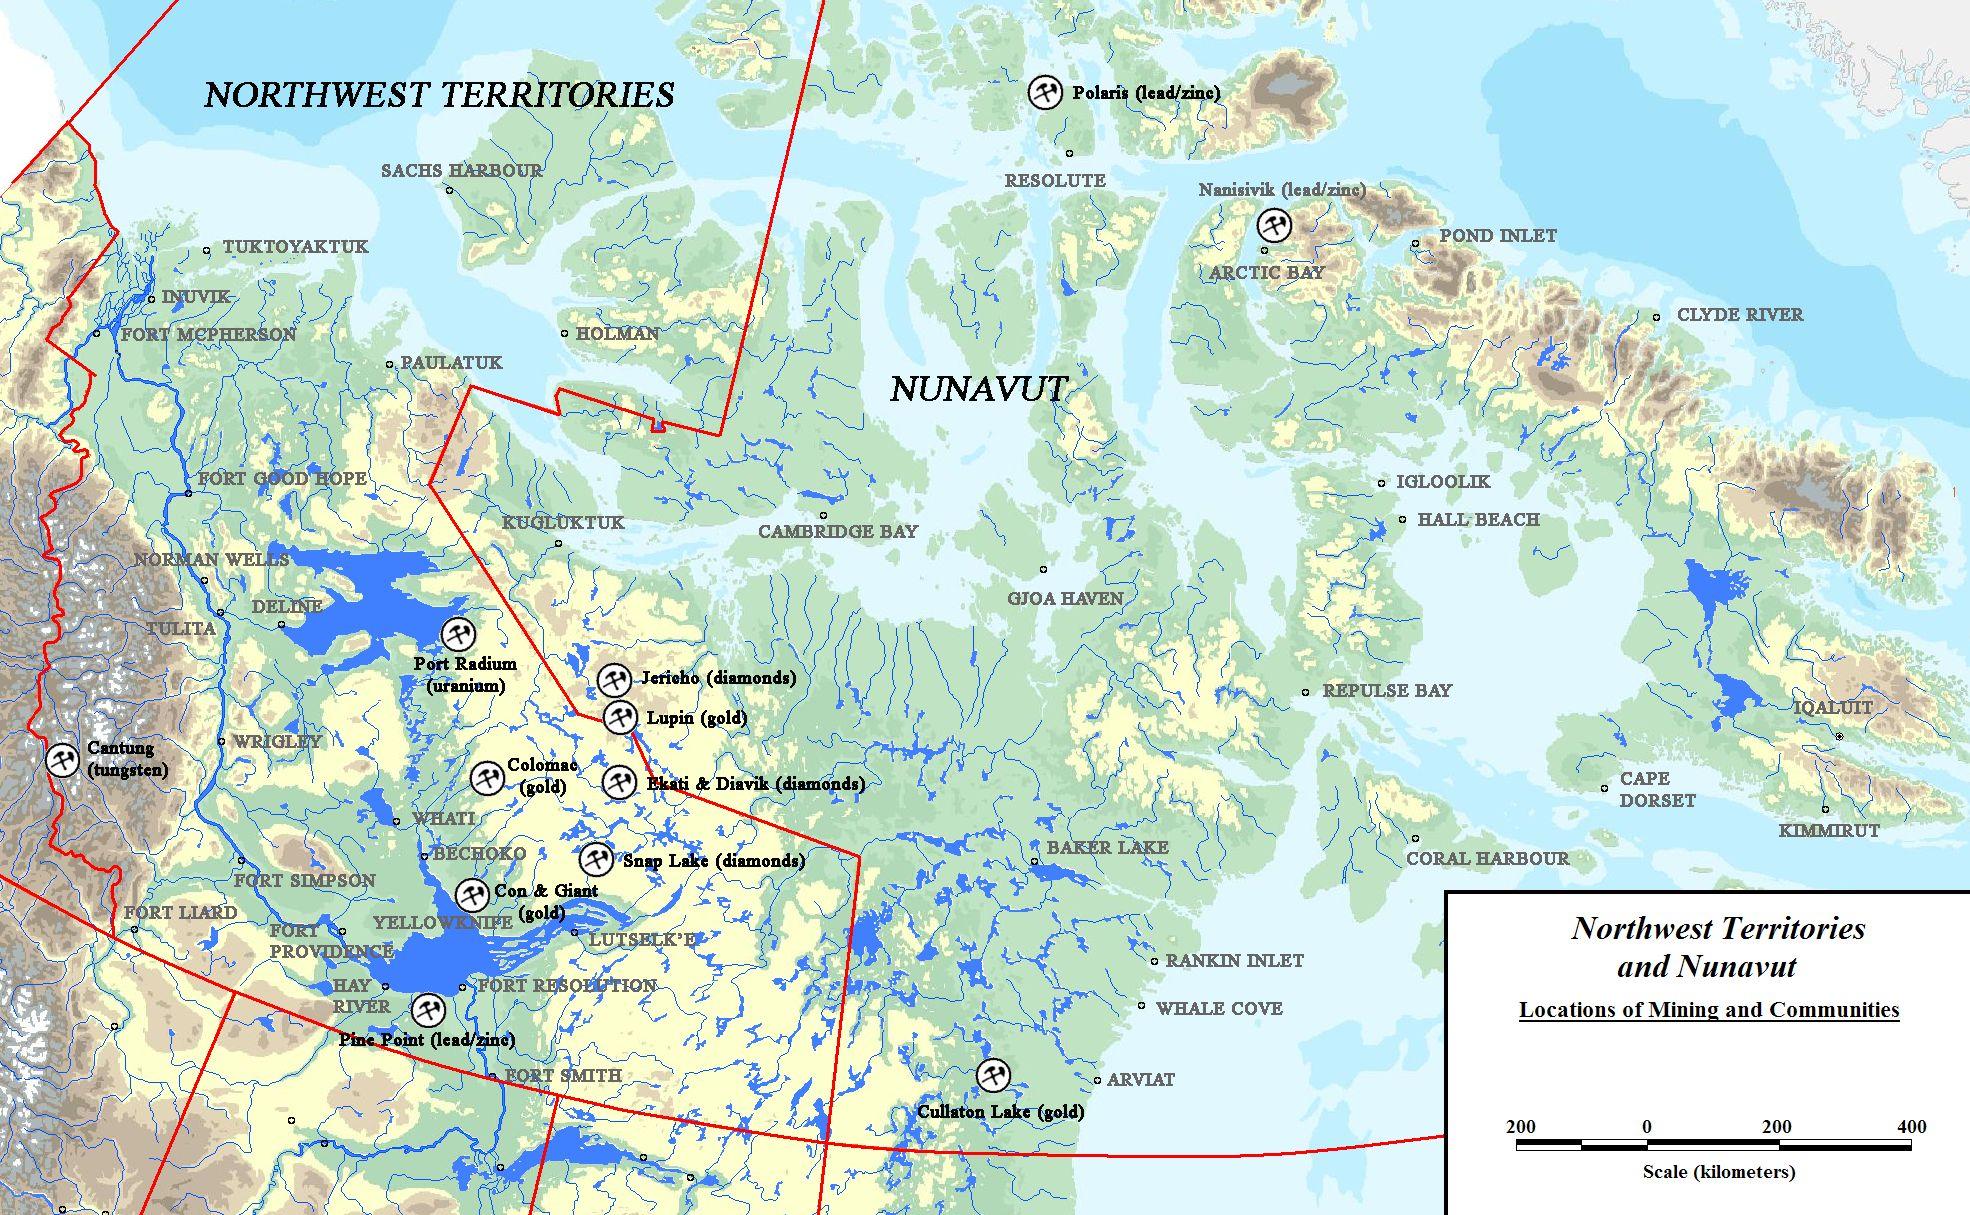 Nwt nunavut mining regulations in canada